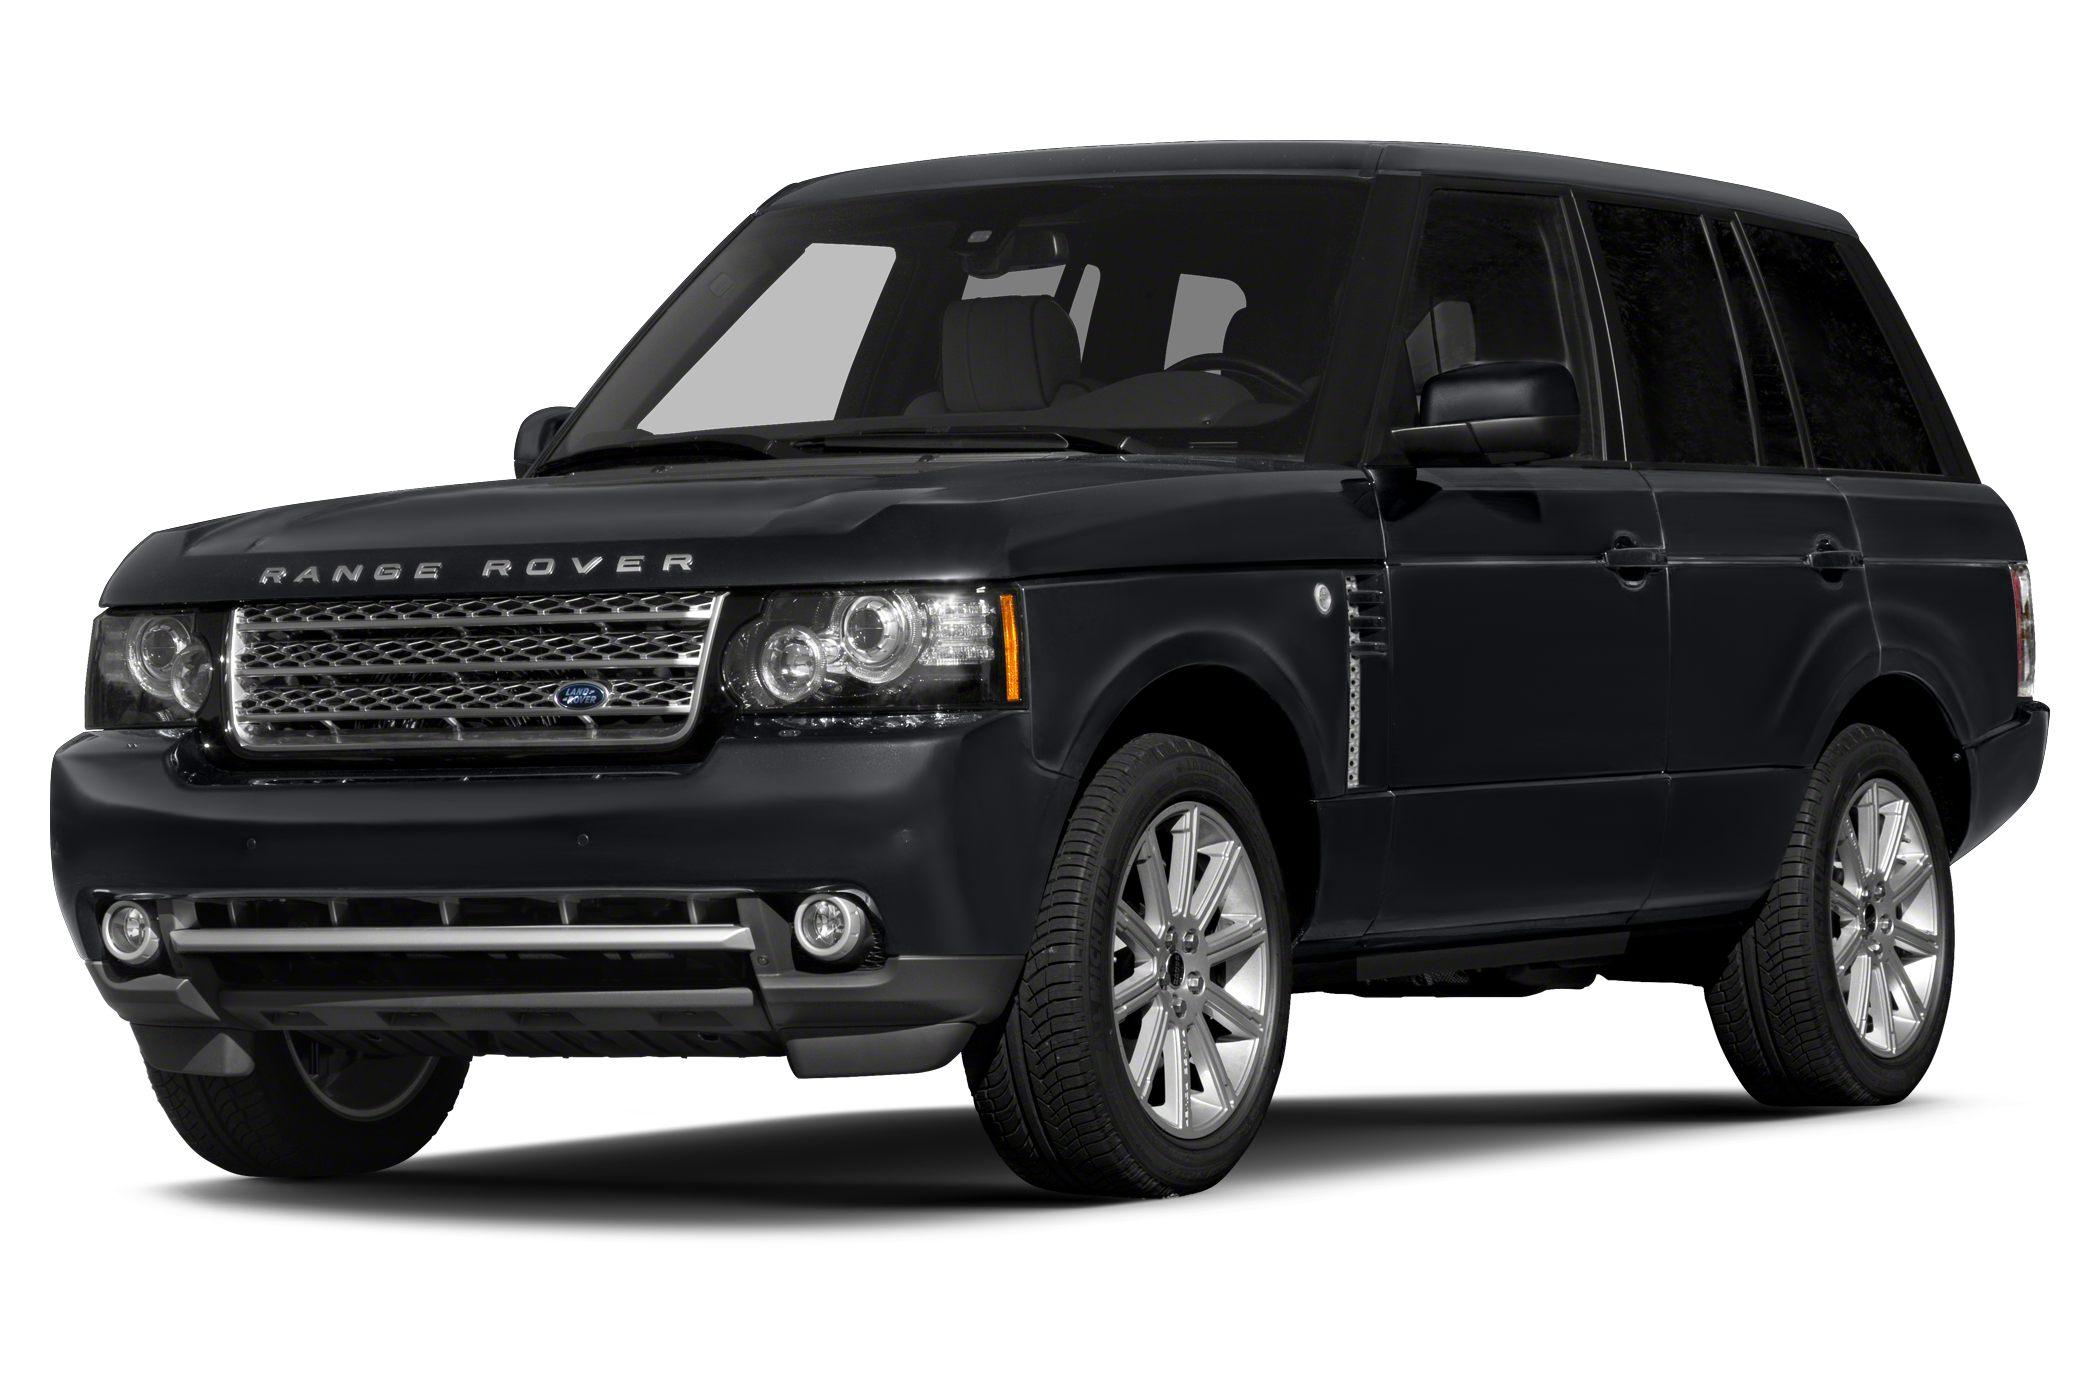 2012 Land Rover Range Rover Information